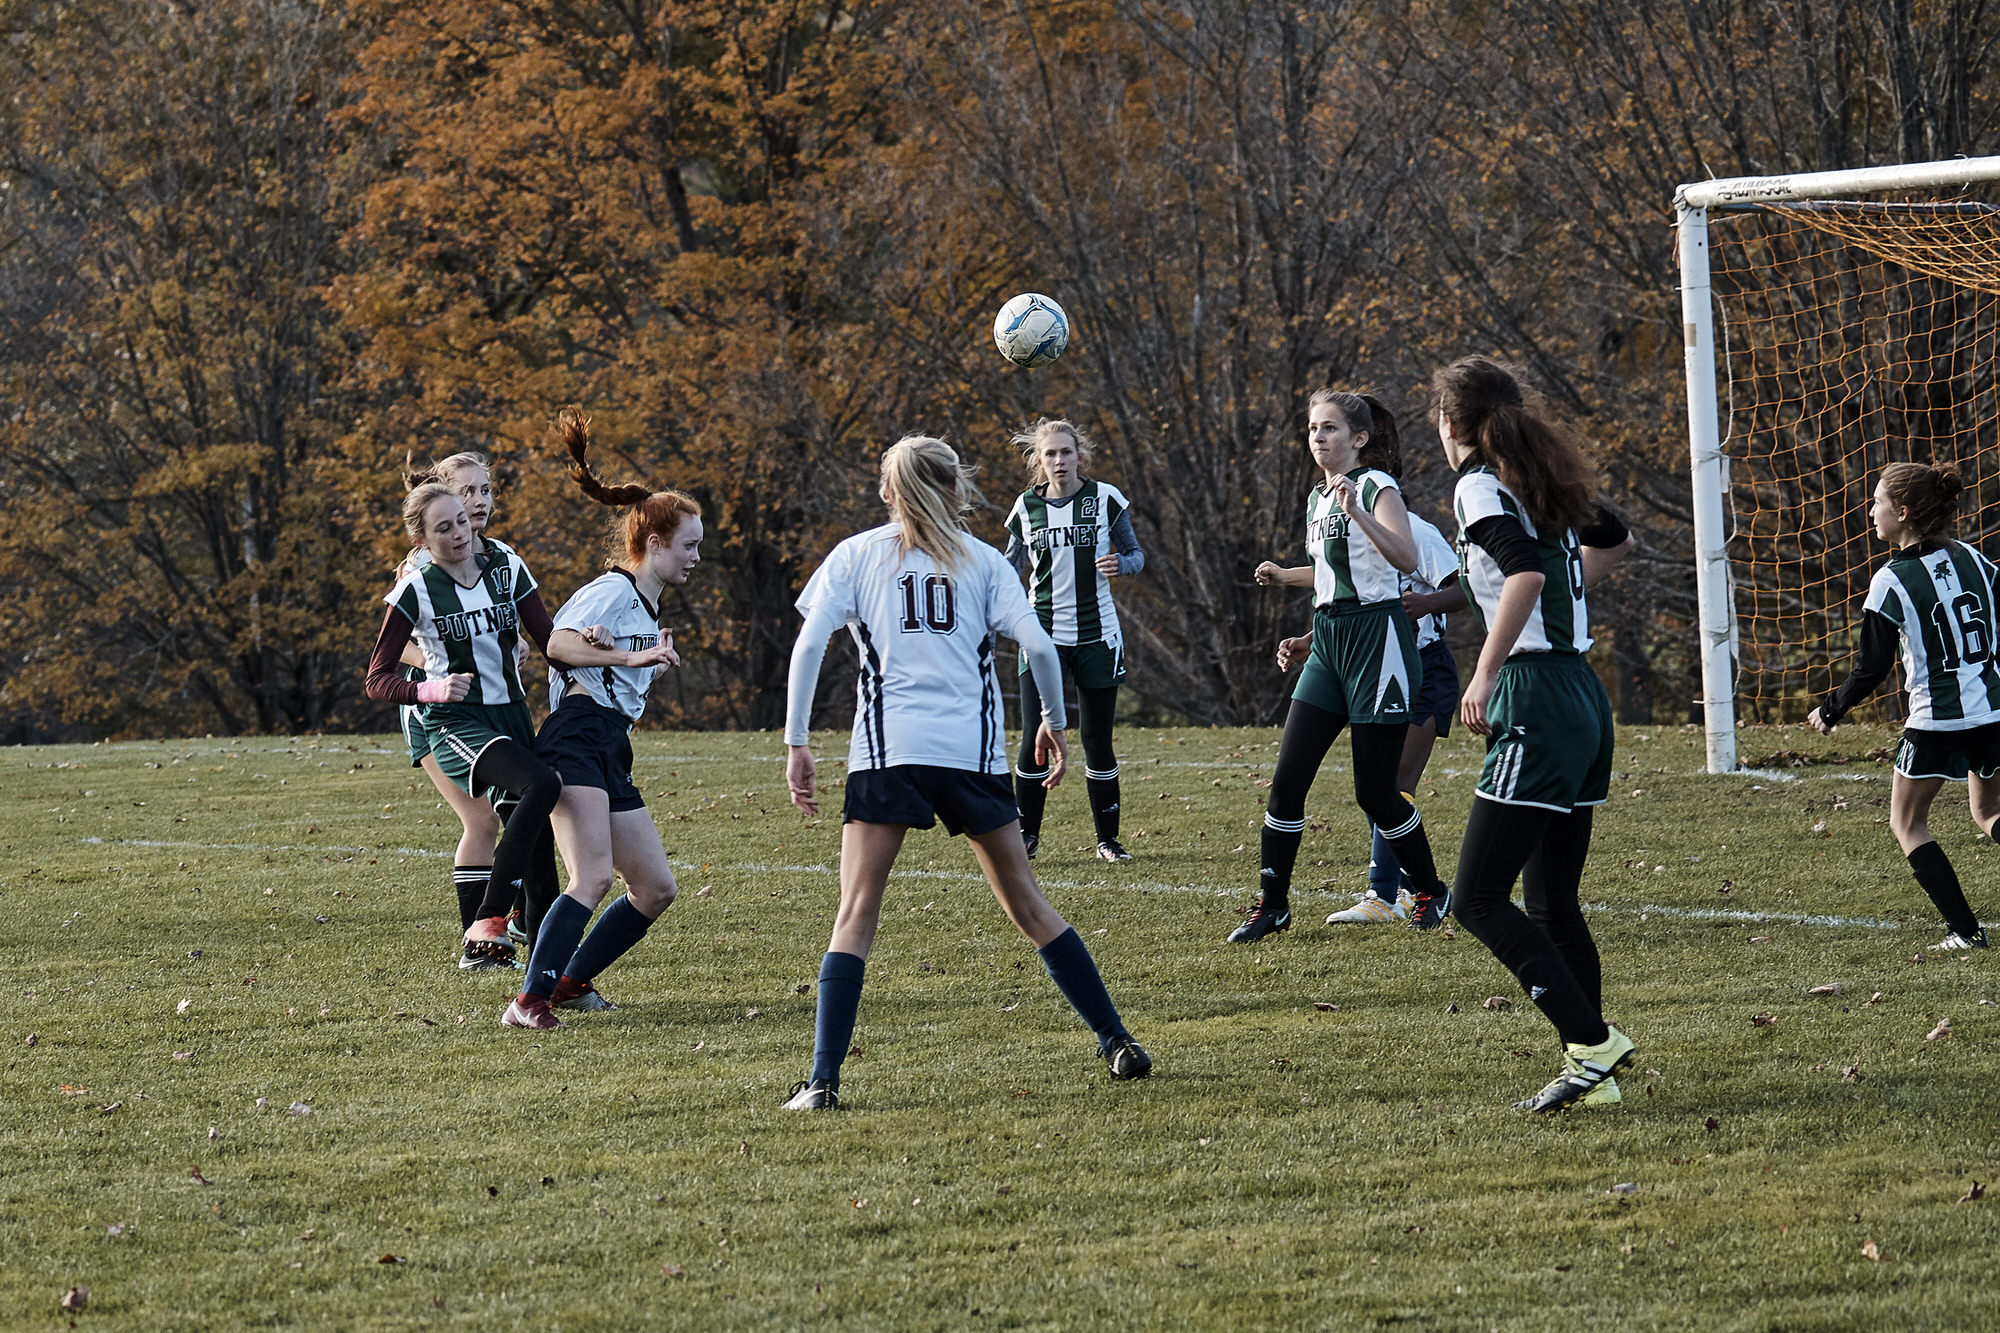 Girls Varsity Soccer vs. Putney School - October 26, 2018 - 043.jpg